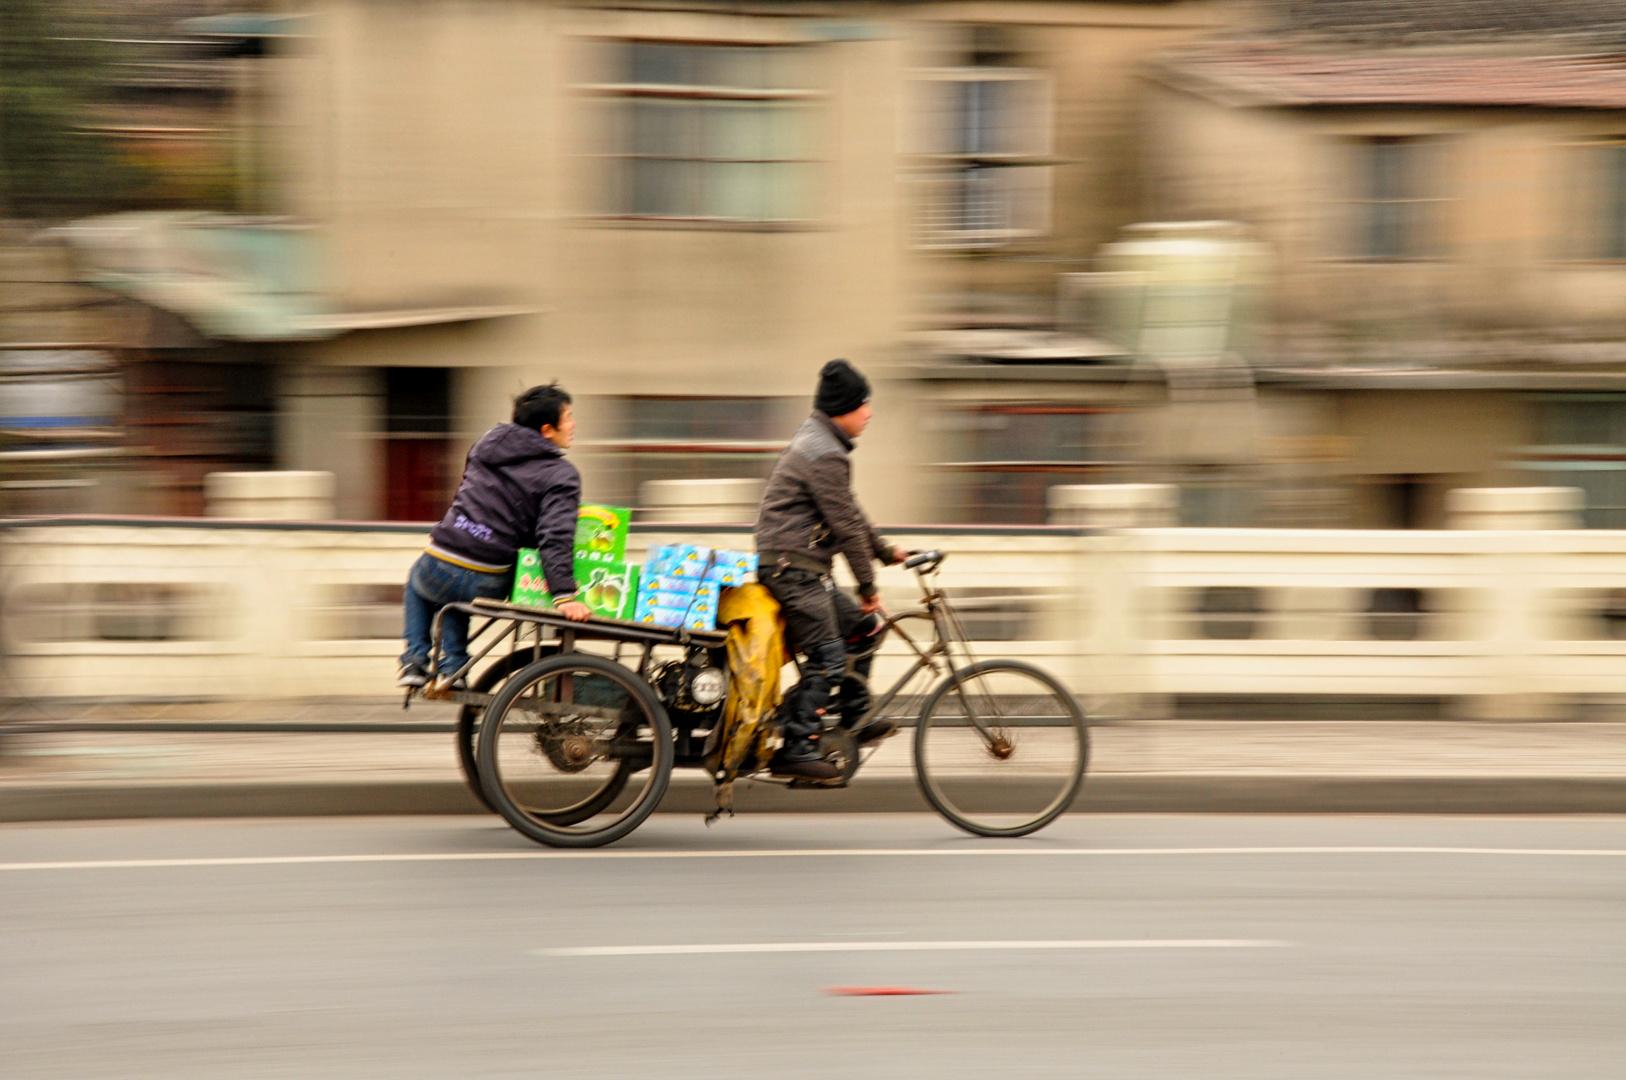 Mitzieher Panning Fahrrad Elektroroller Dreirad Shanghai China überall